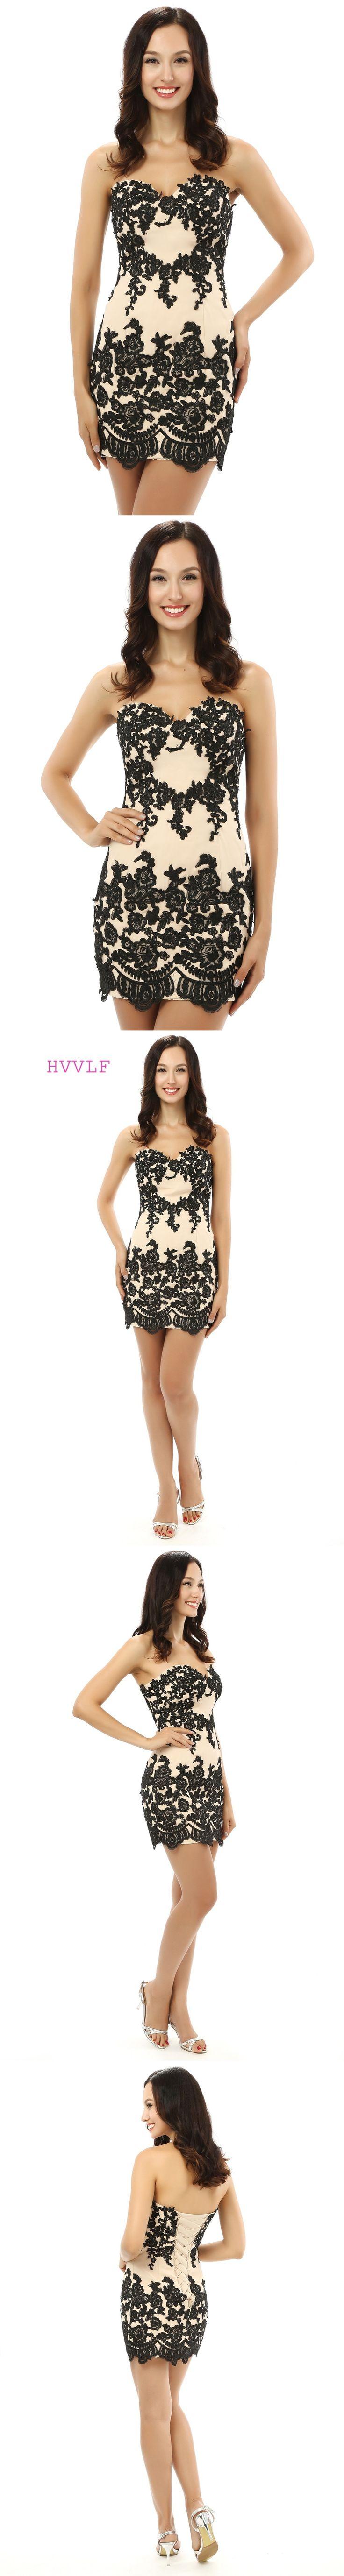 175 best Cocktail Dresses images on Pinterest